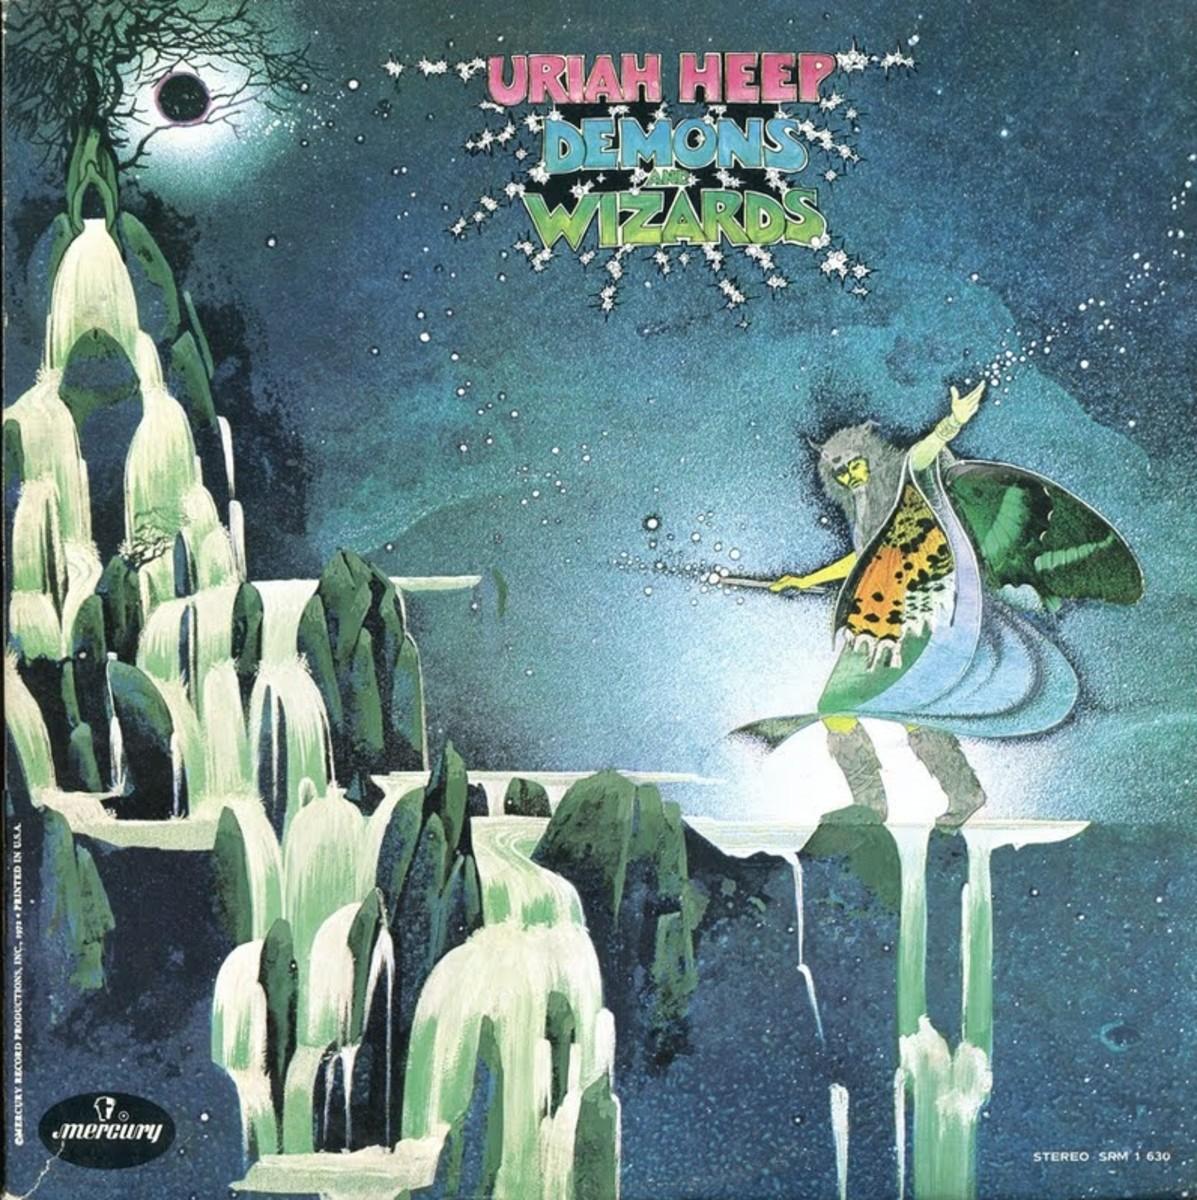 "Uriah Heep ""Demons and Wizards"" Mercury Records SRM-1-630 2-12"" LP Vinyl Record, Set US Pressing (1972) Gatefold Album Cover Art by Roger Dean"